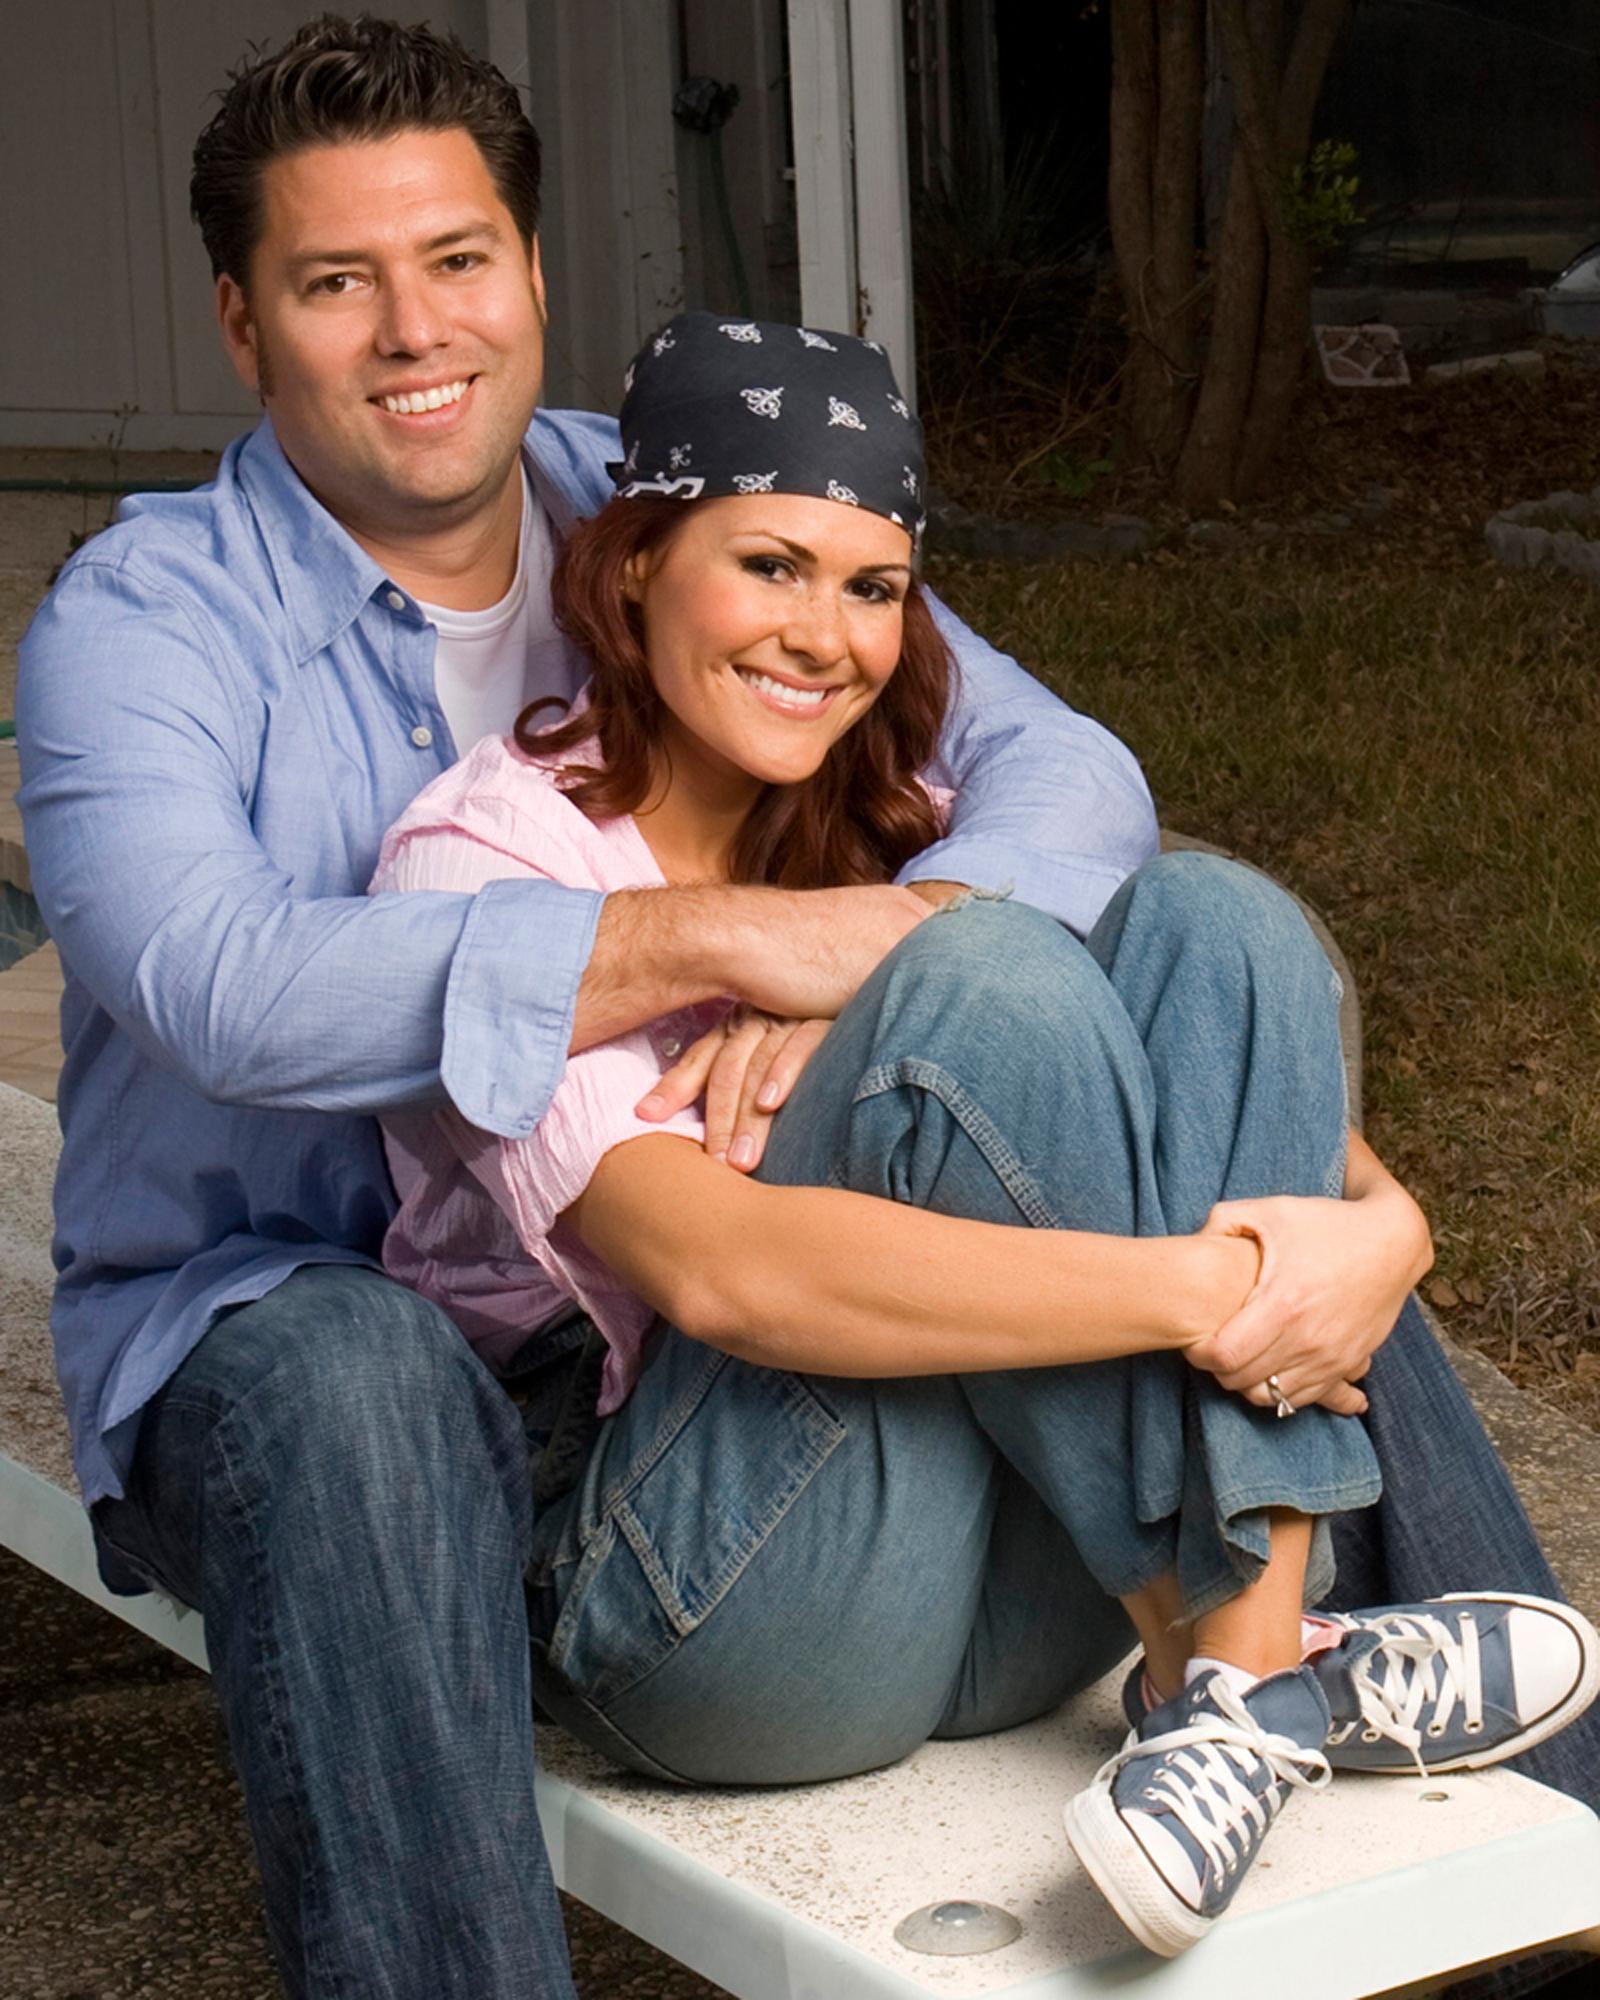 Montelongo Divorce Documents Reveal Eye Popping Spousal